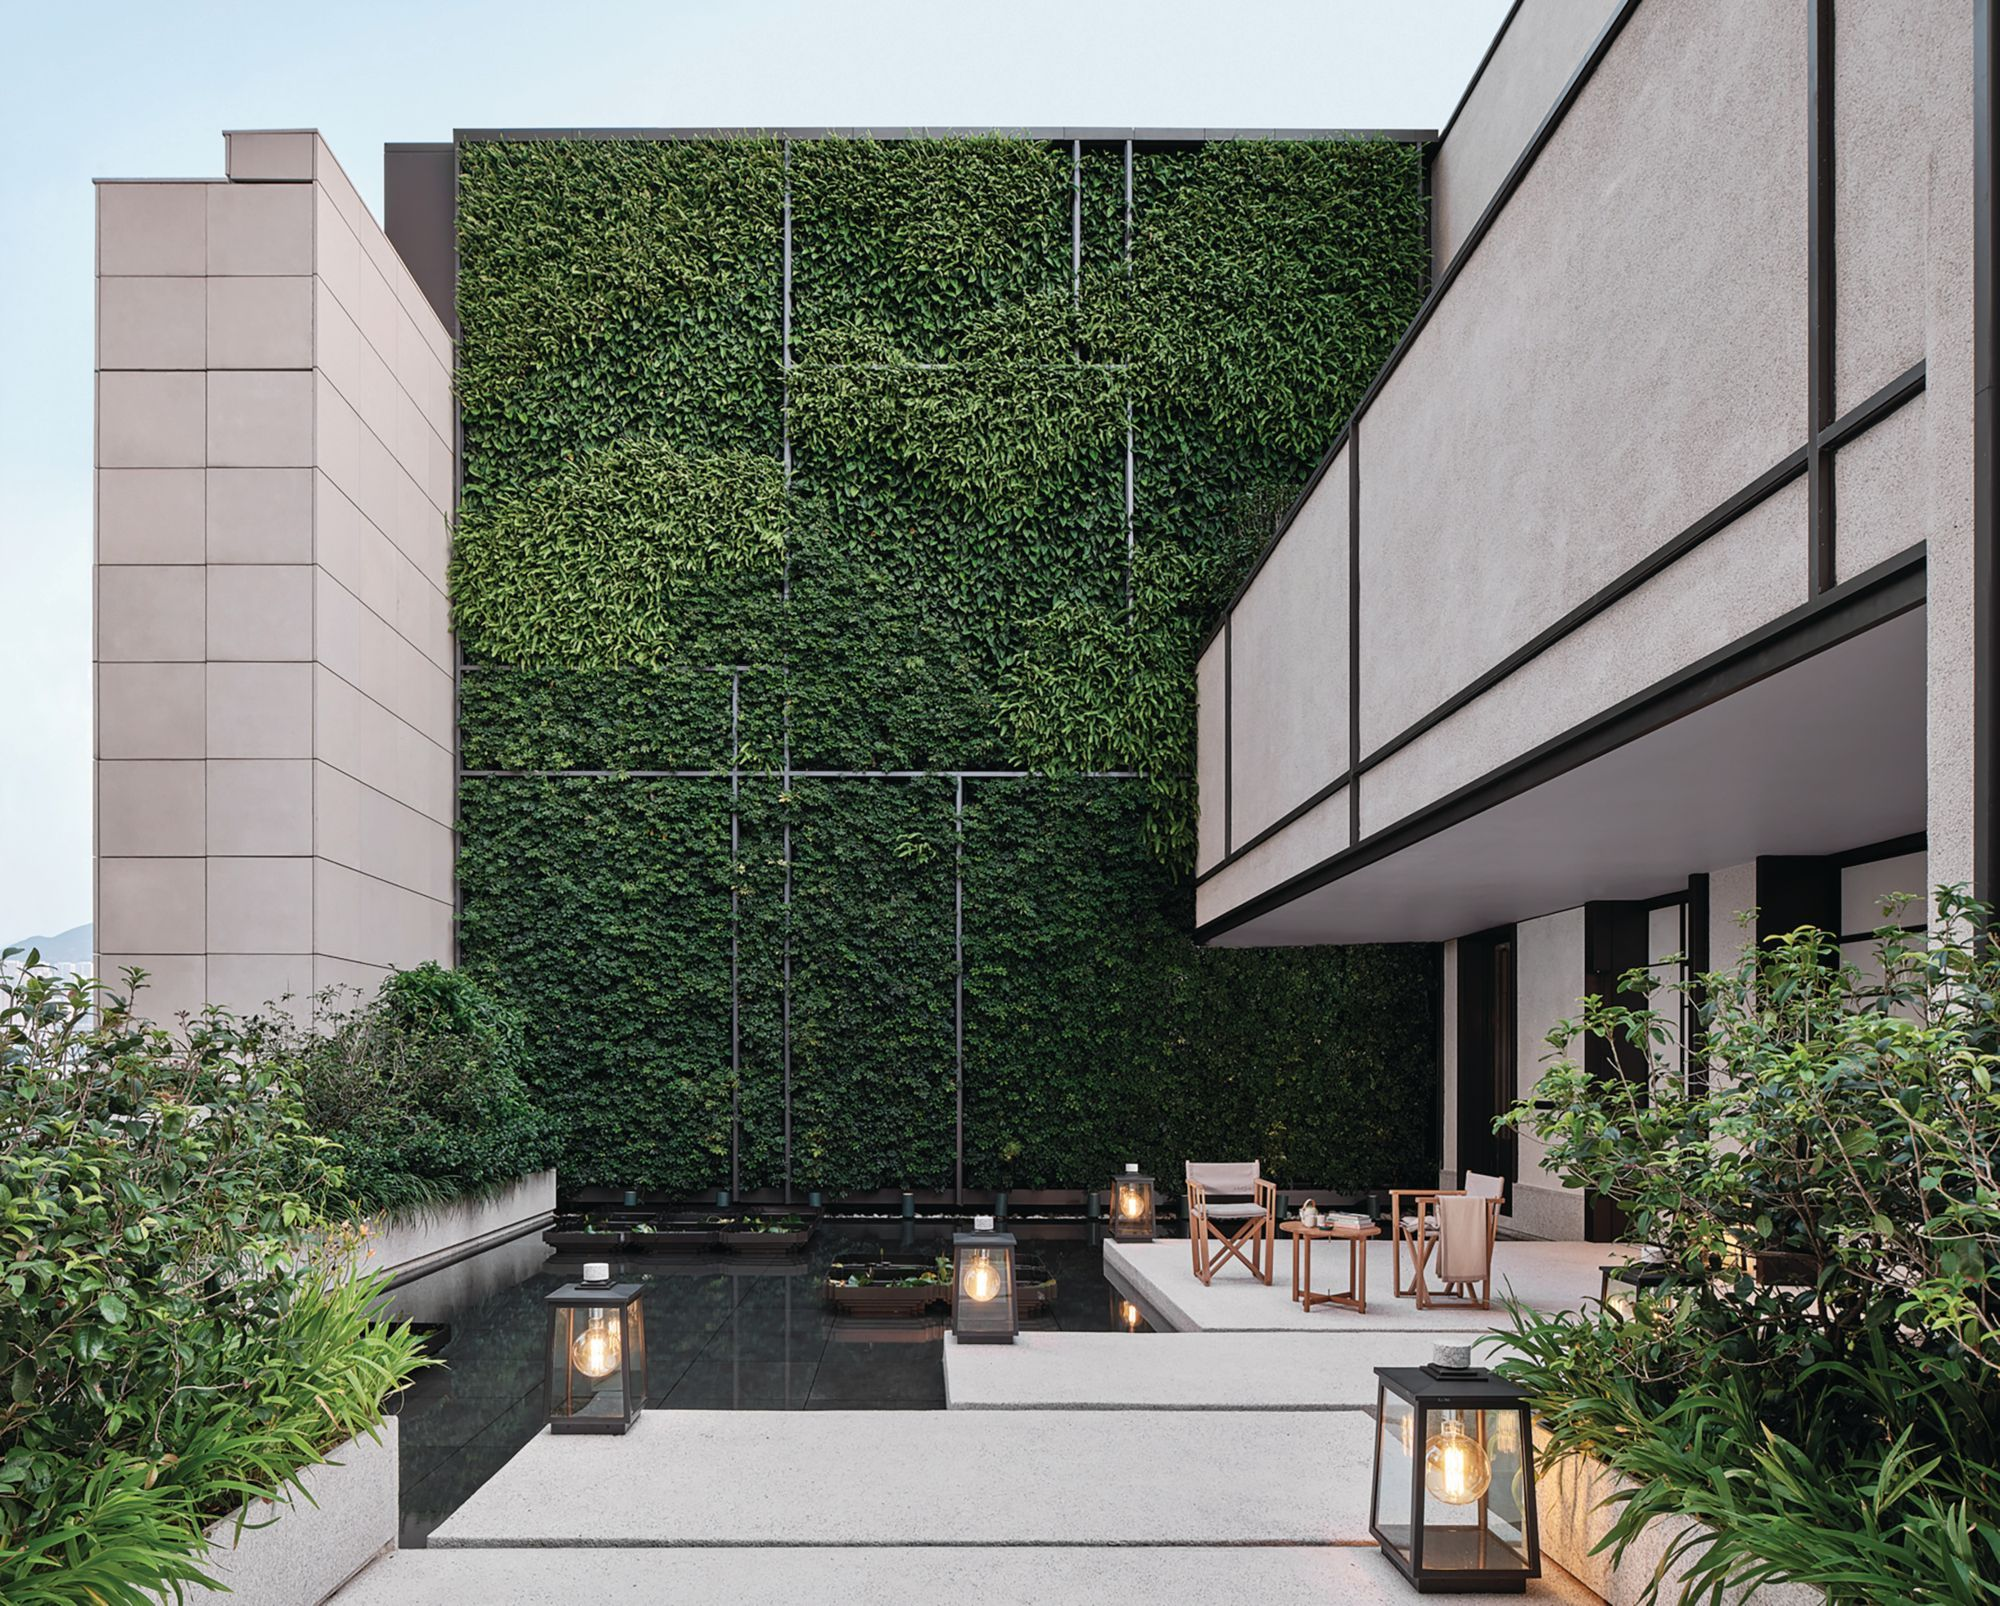 Rosewood Hotels & Resorts Debuts A New Wellness Retreat Concept